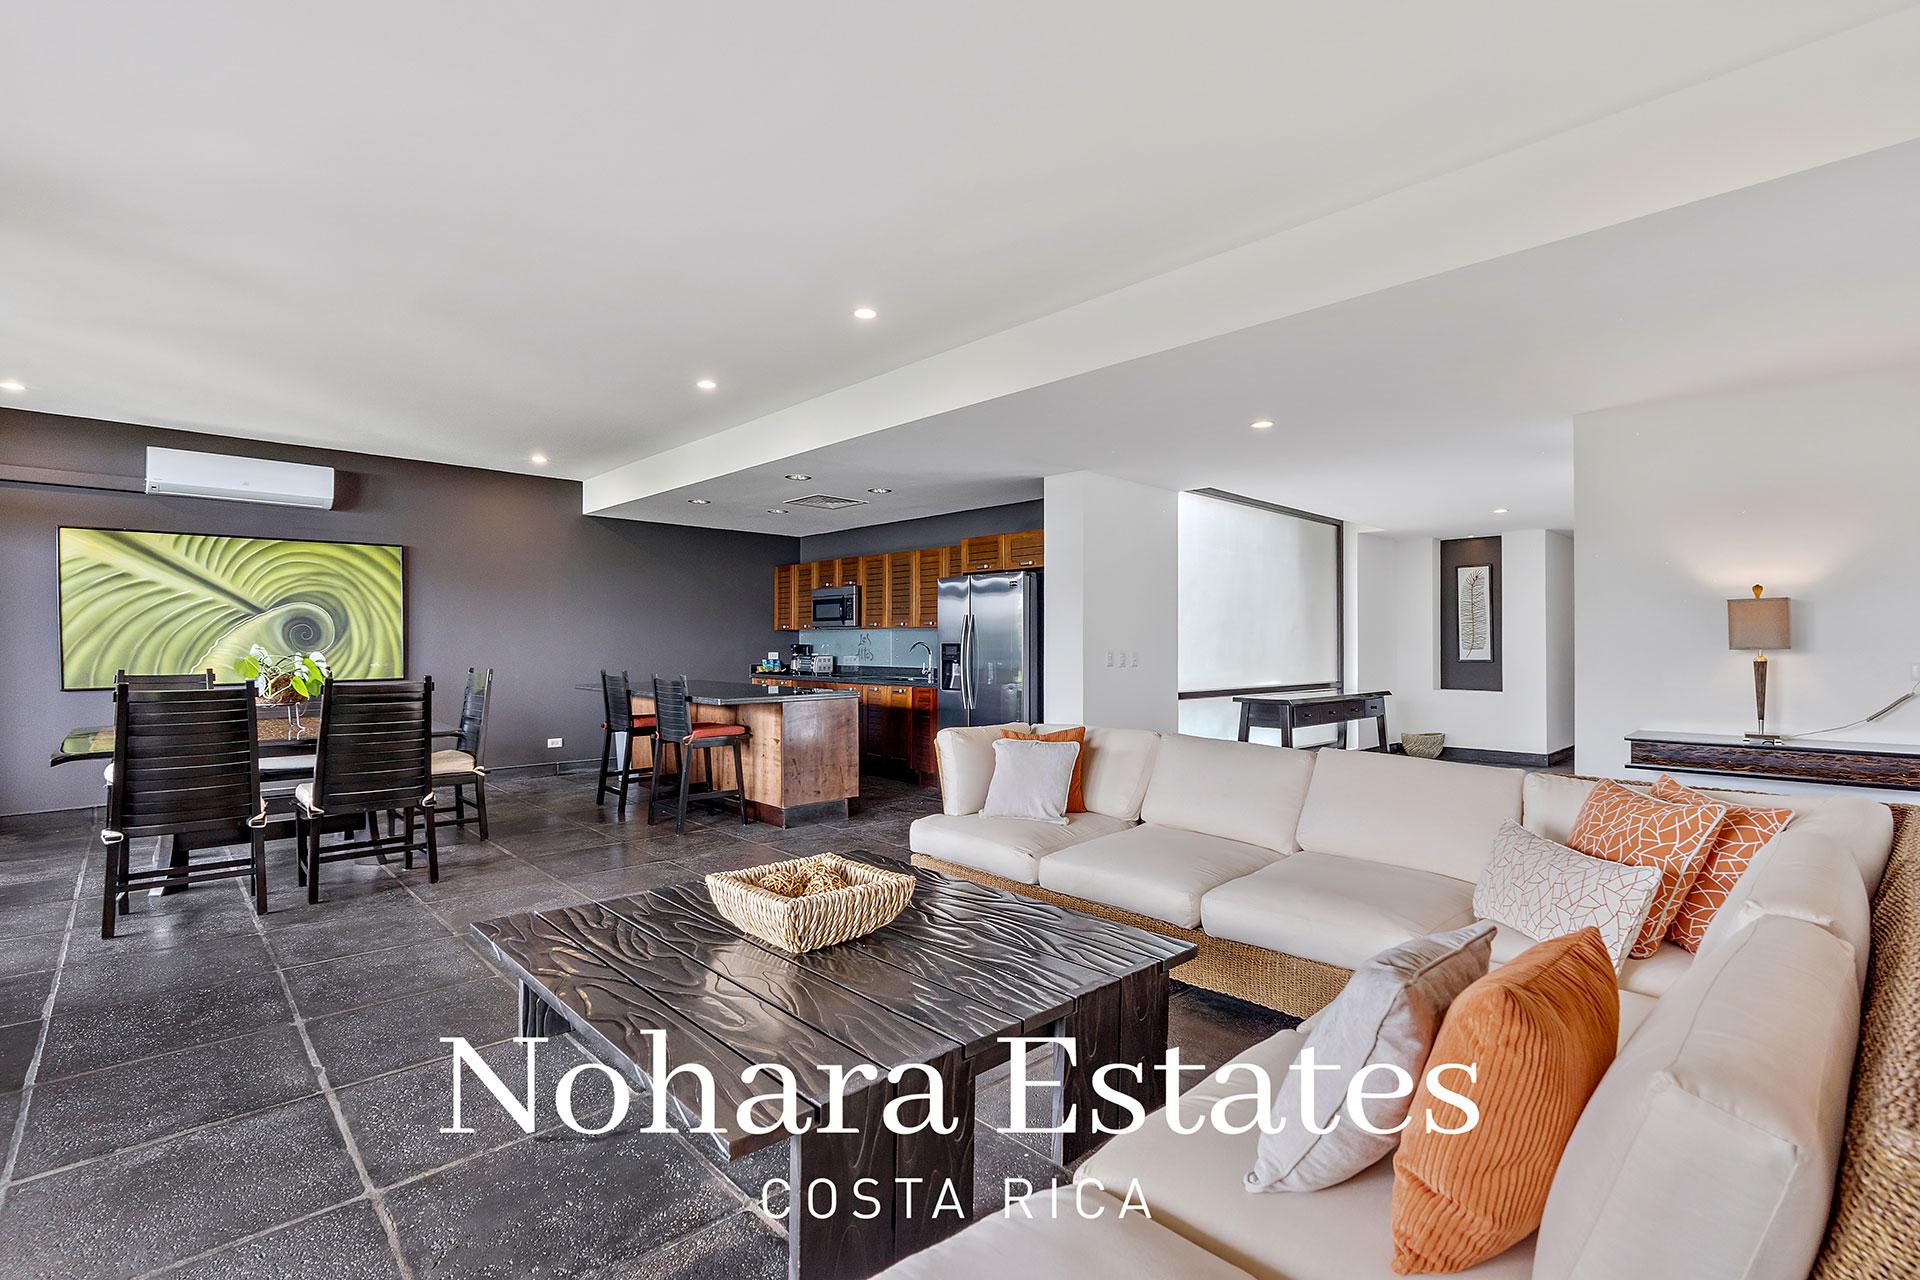 Nohara Estates Costa Rica 125 Apartment Quepos Los Altos 14